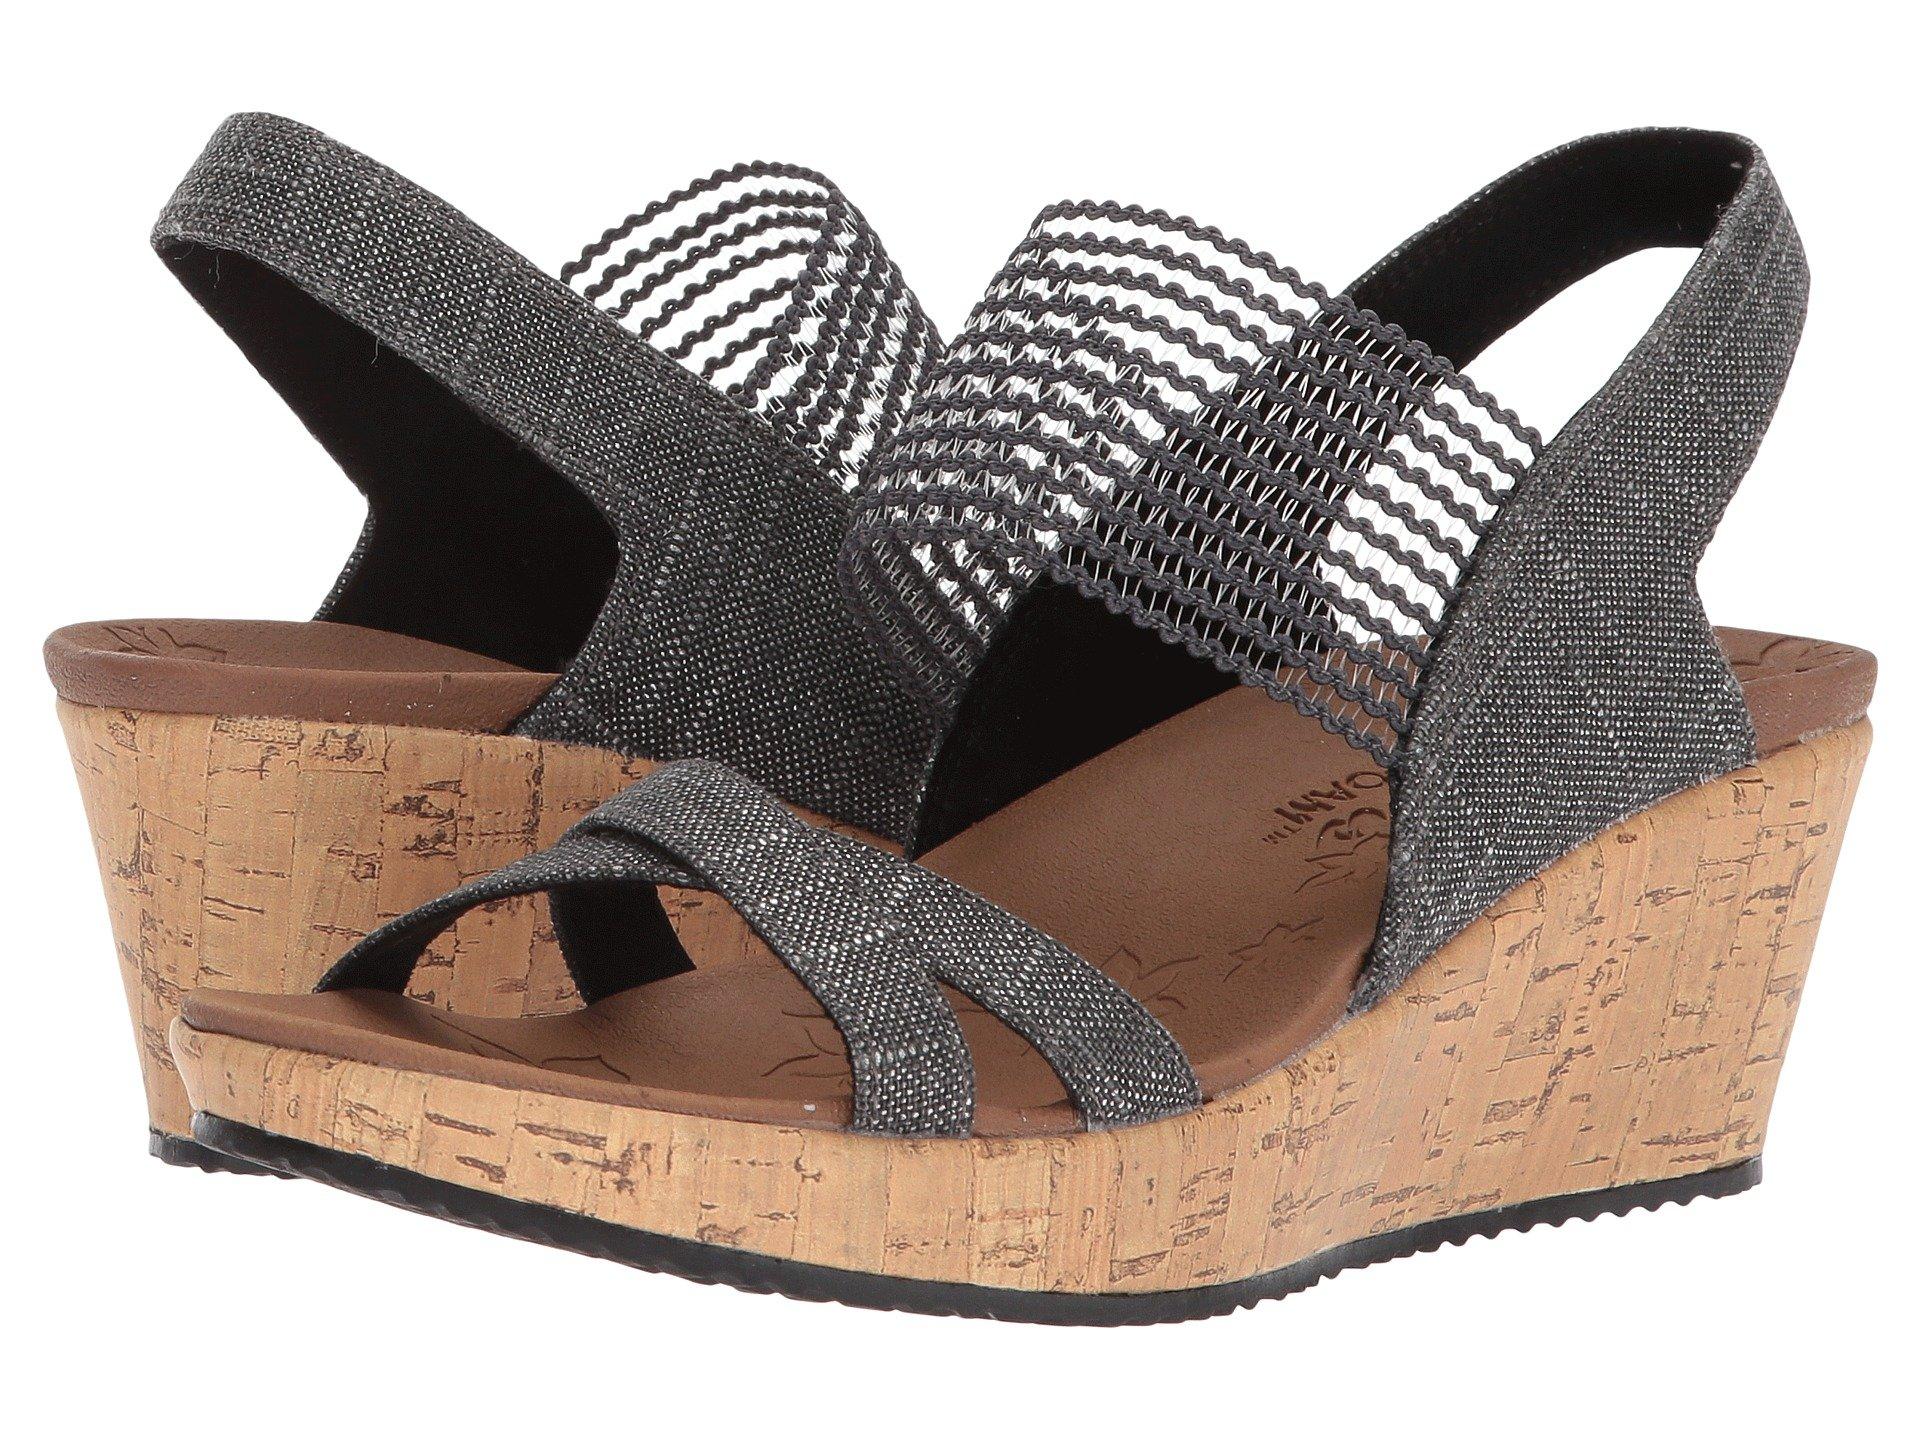 7c2157785641 Women s SKECHERS Sandals + FREE SHIPPING